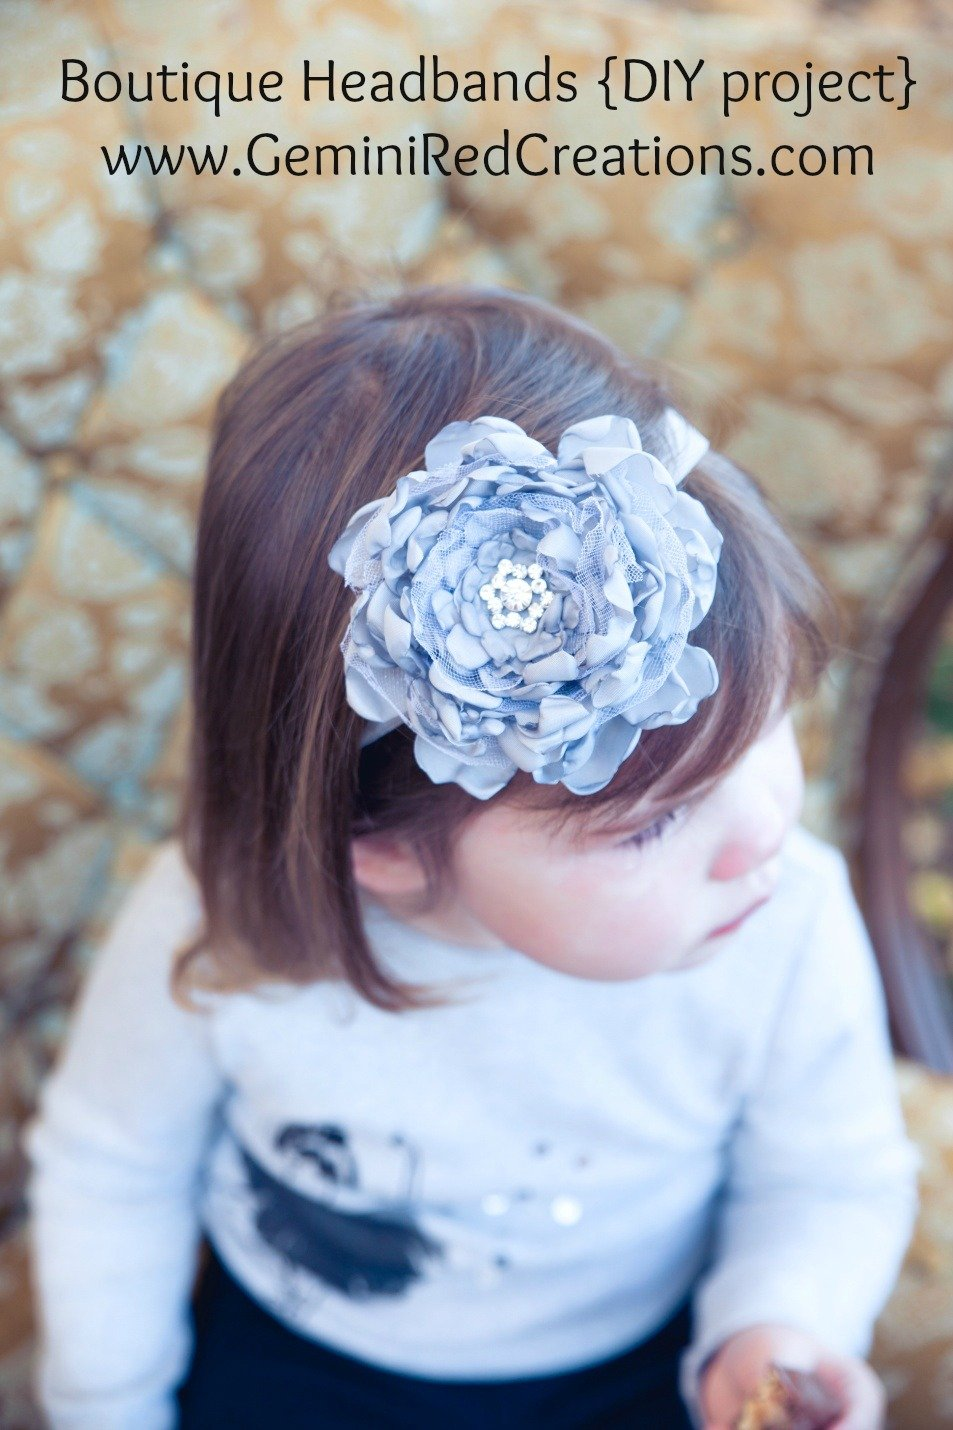 Boutique Headbands {DIY project}